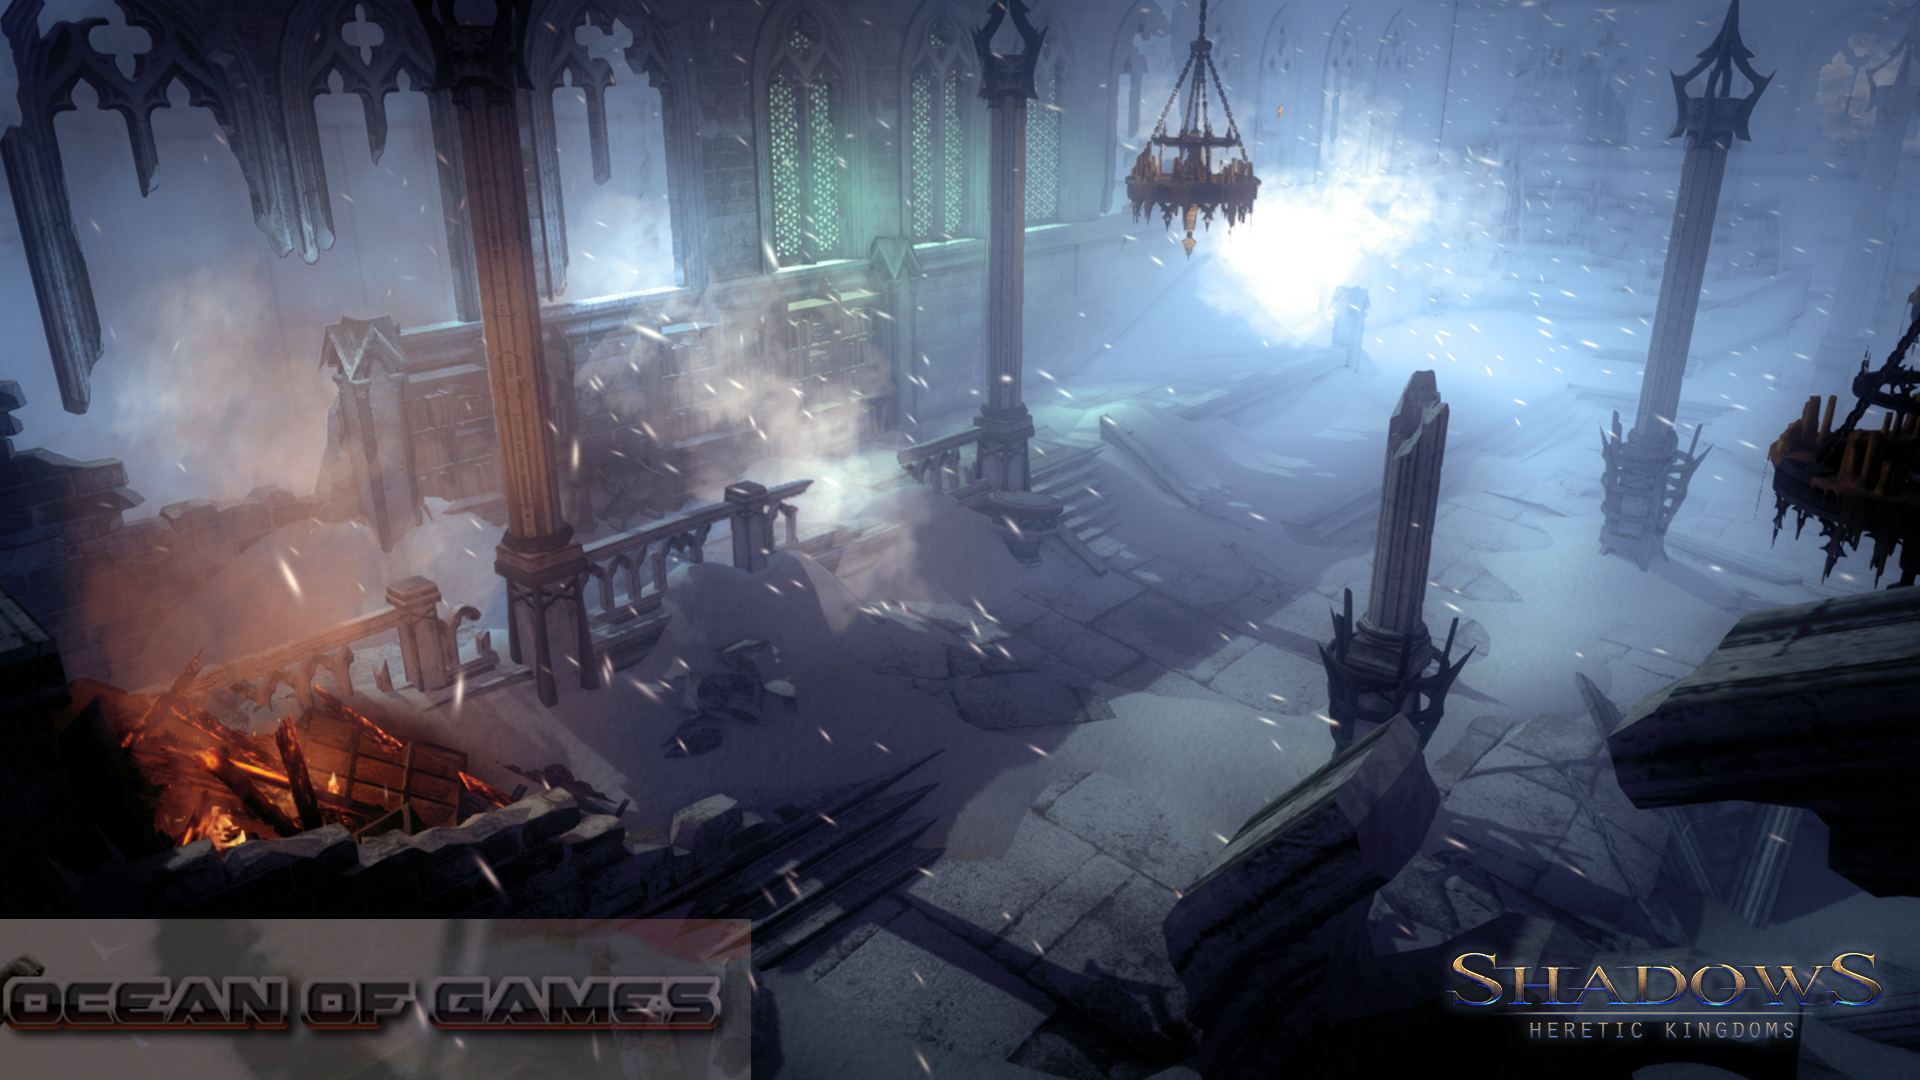 Shadows Heretic Kingdoms 2014 PC Game Free Download